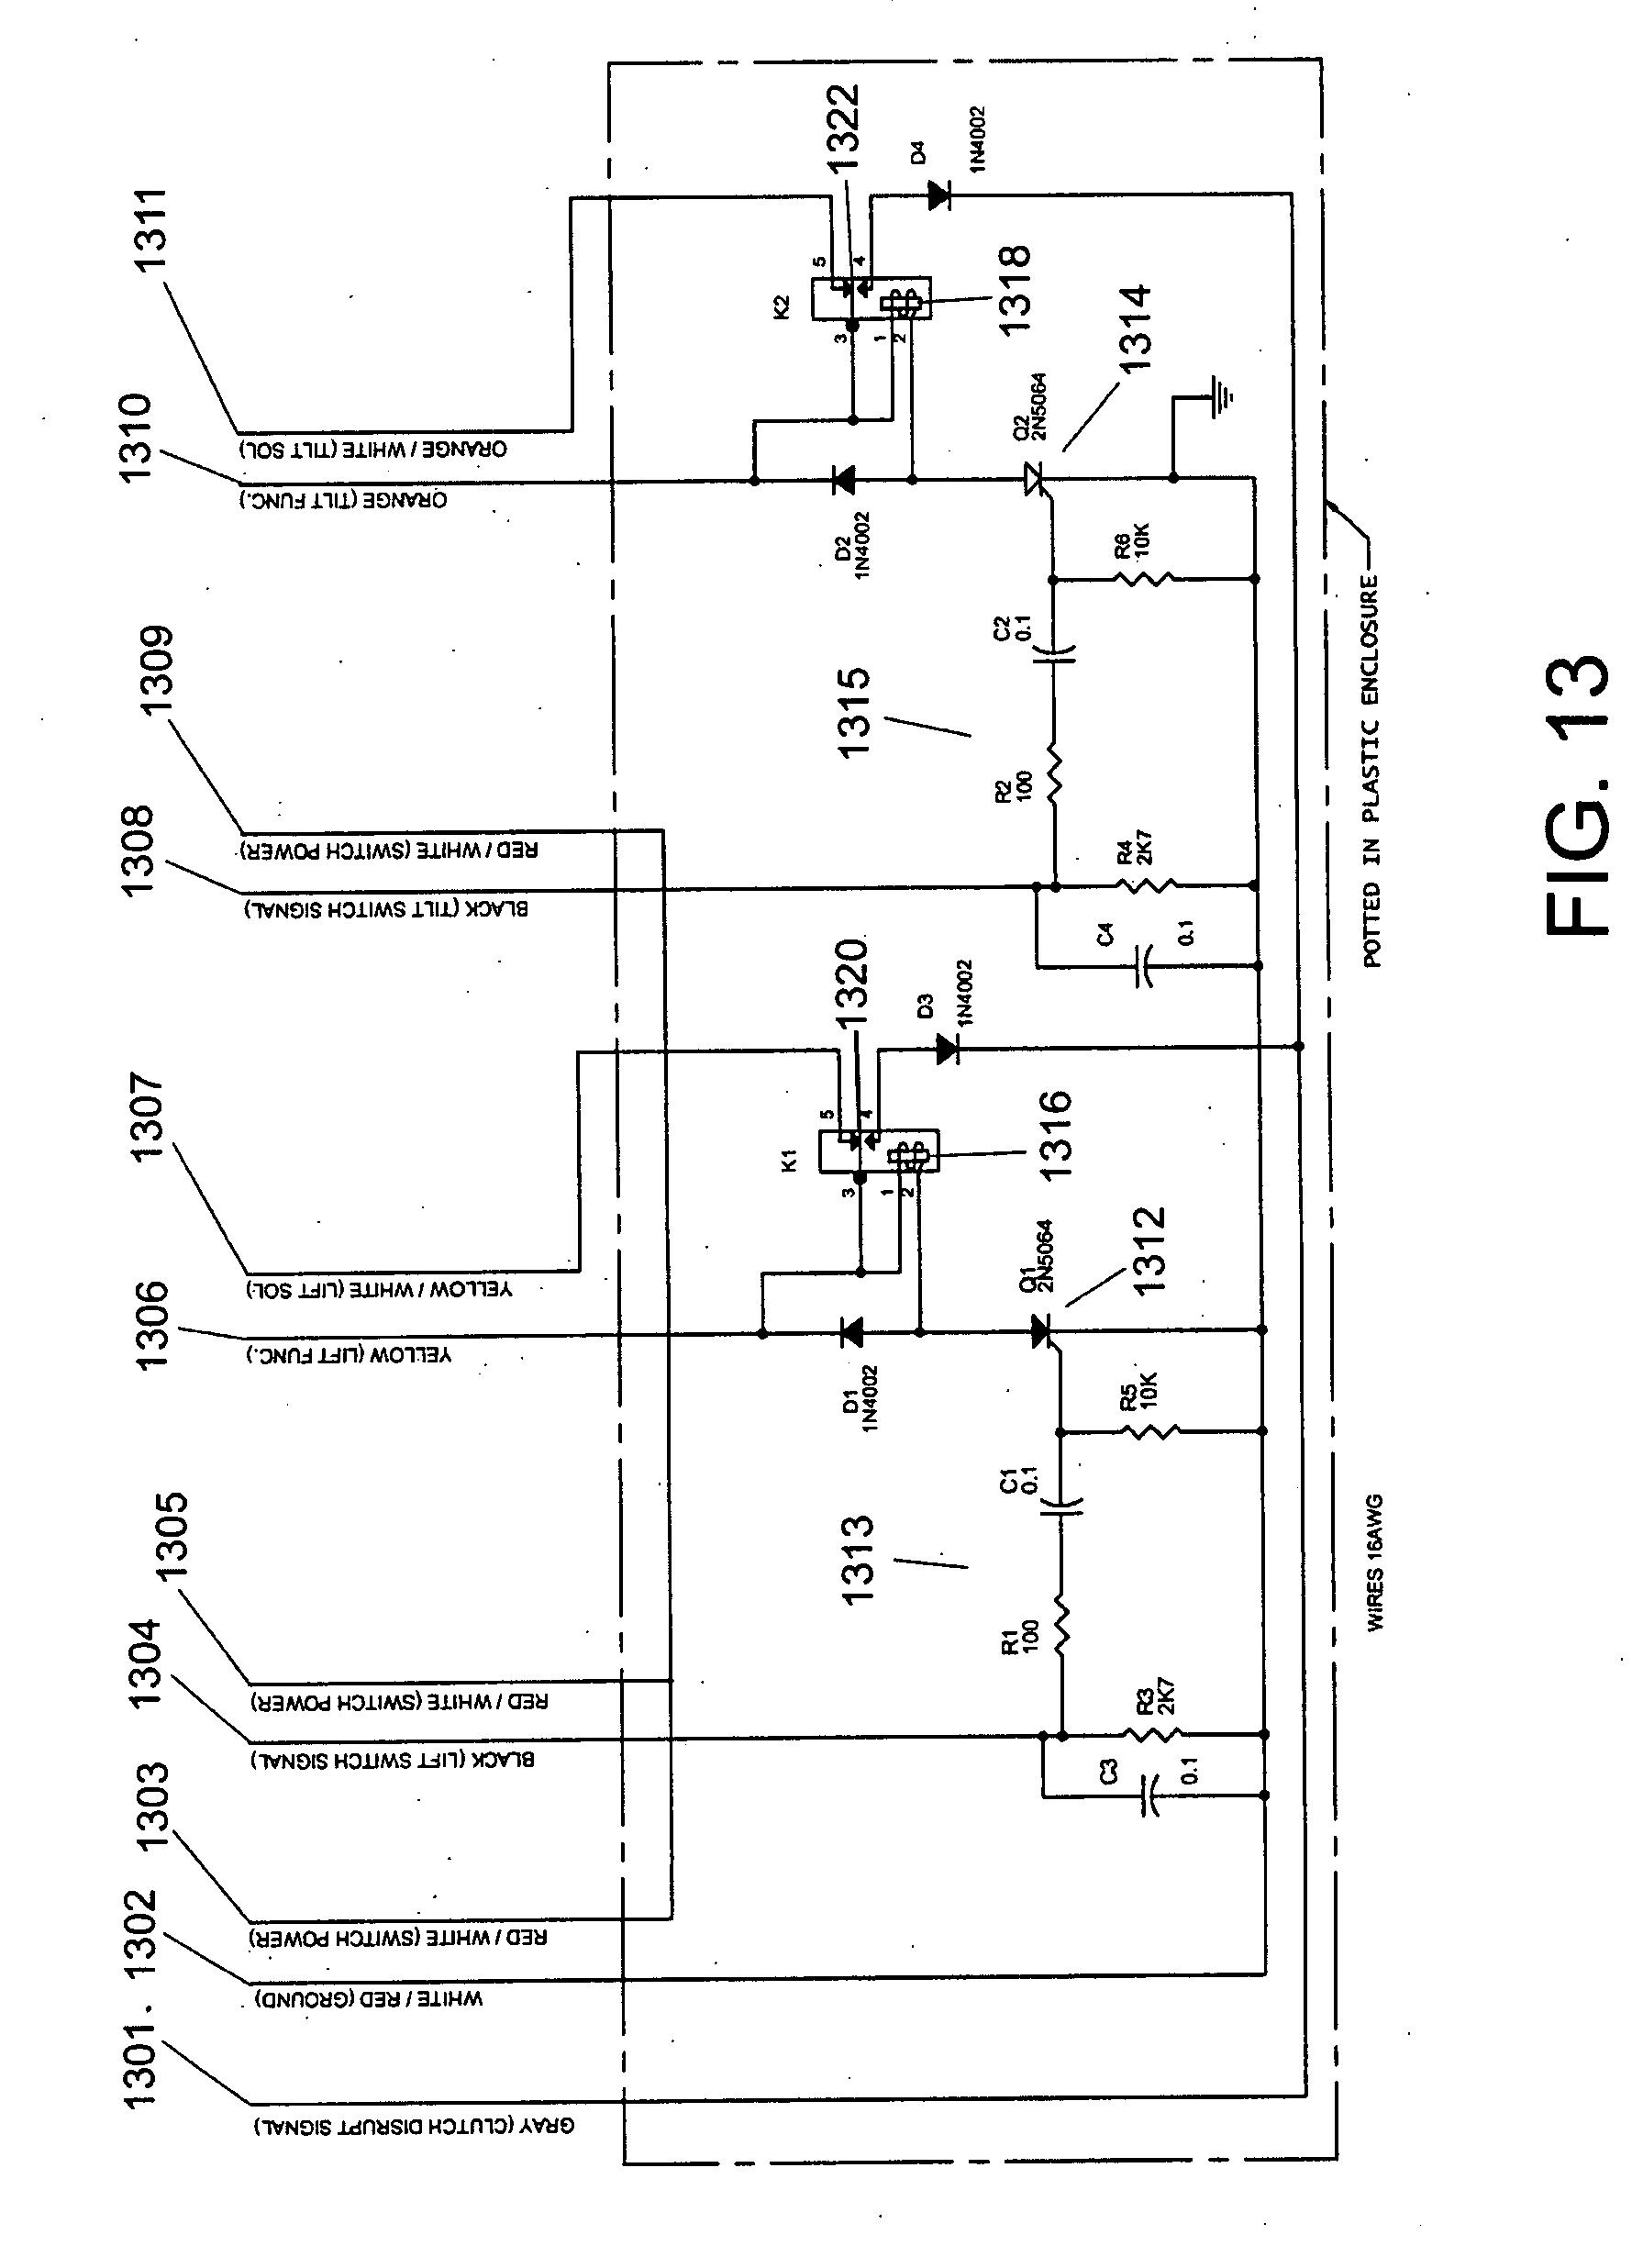 western 1000 salt spreader wiring diagram mercedes diagrams schematics jerr dan roll back parts get free image